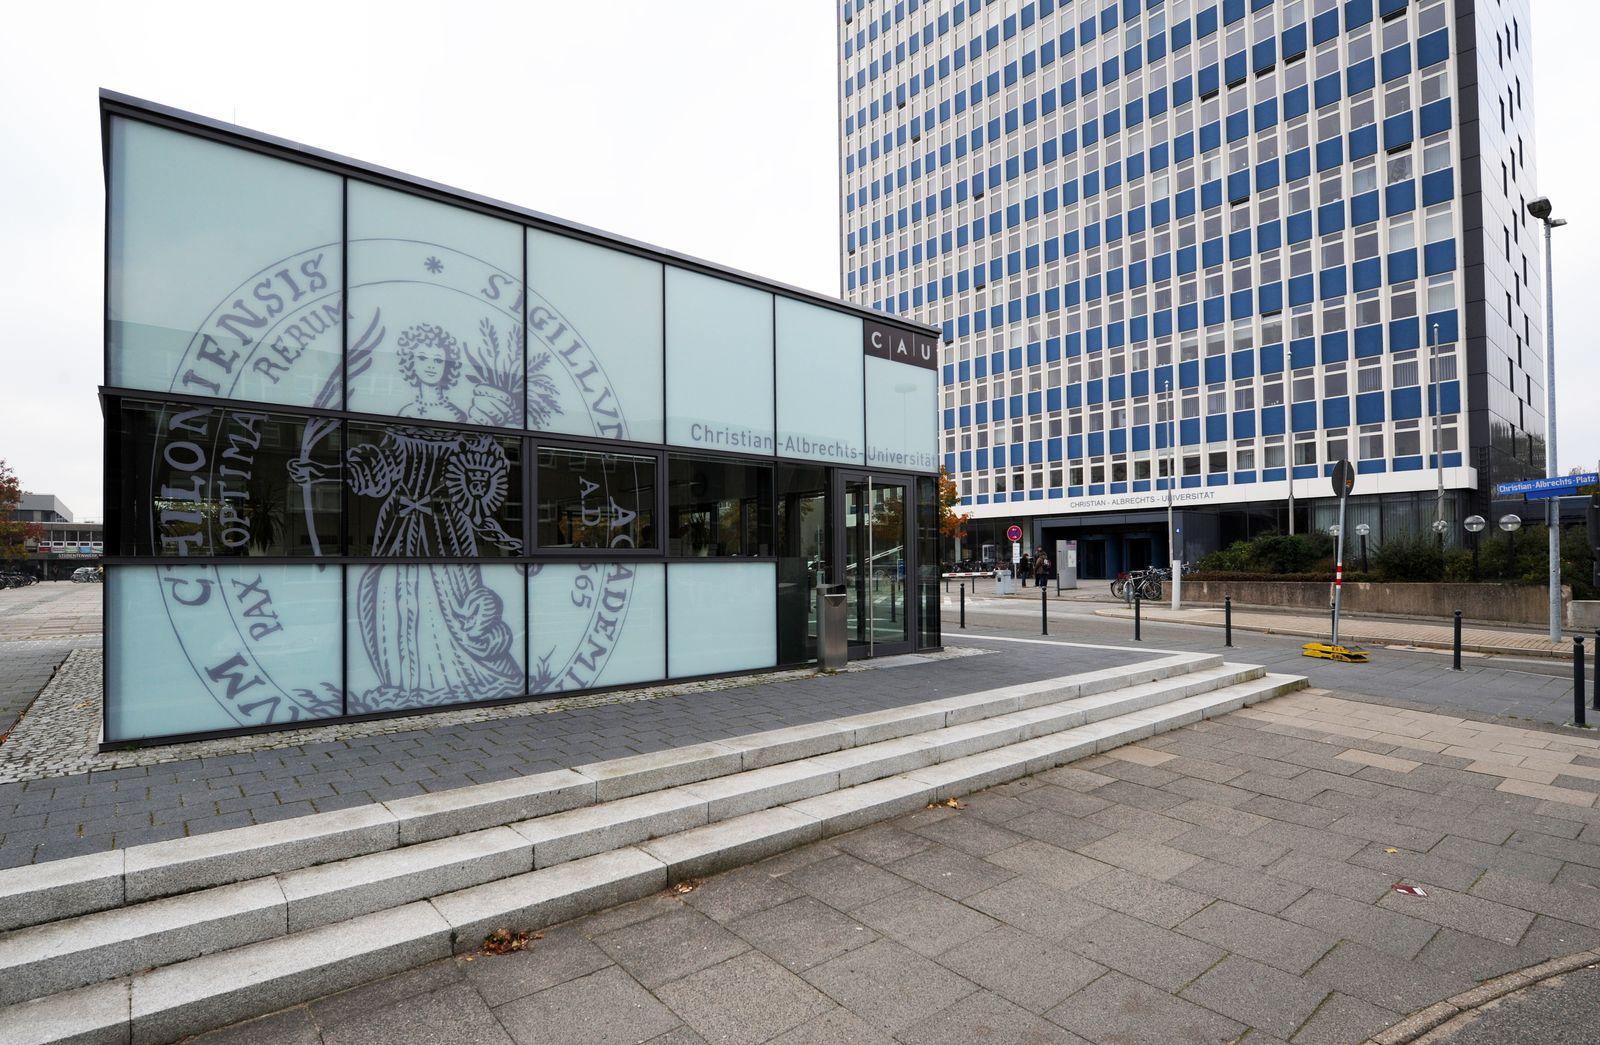 Zivilklausel/ Christian-Albrechts-Universität zu Kiel